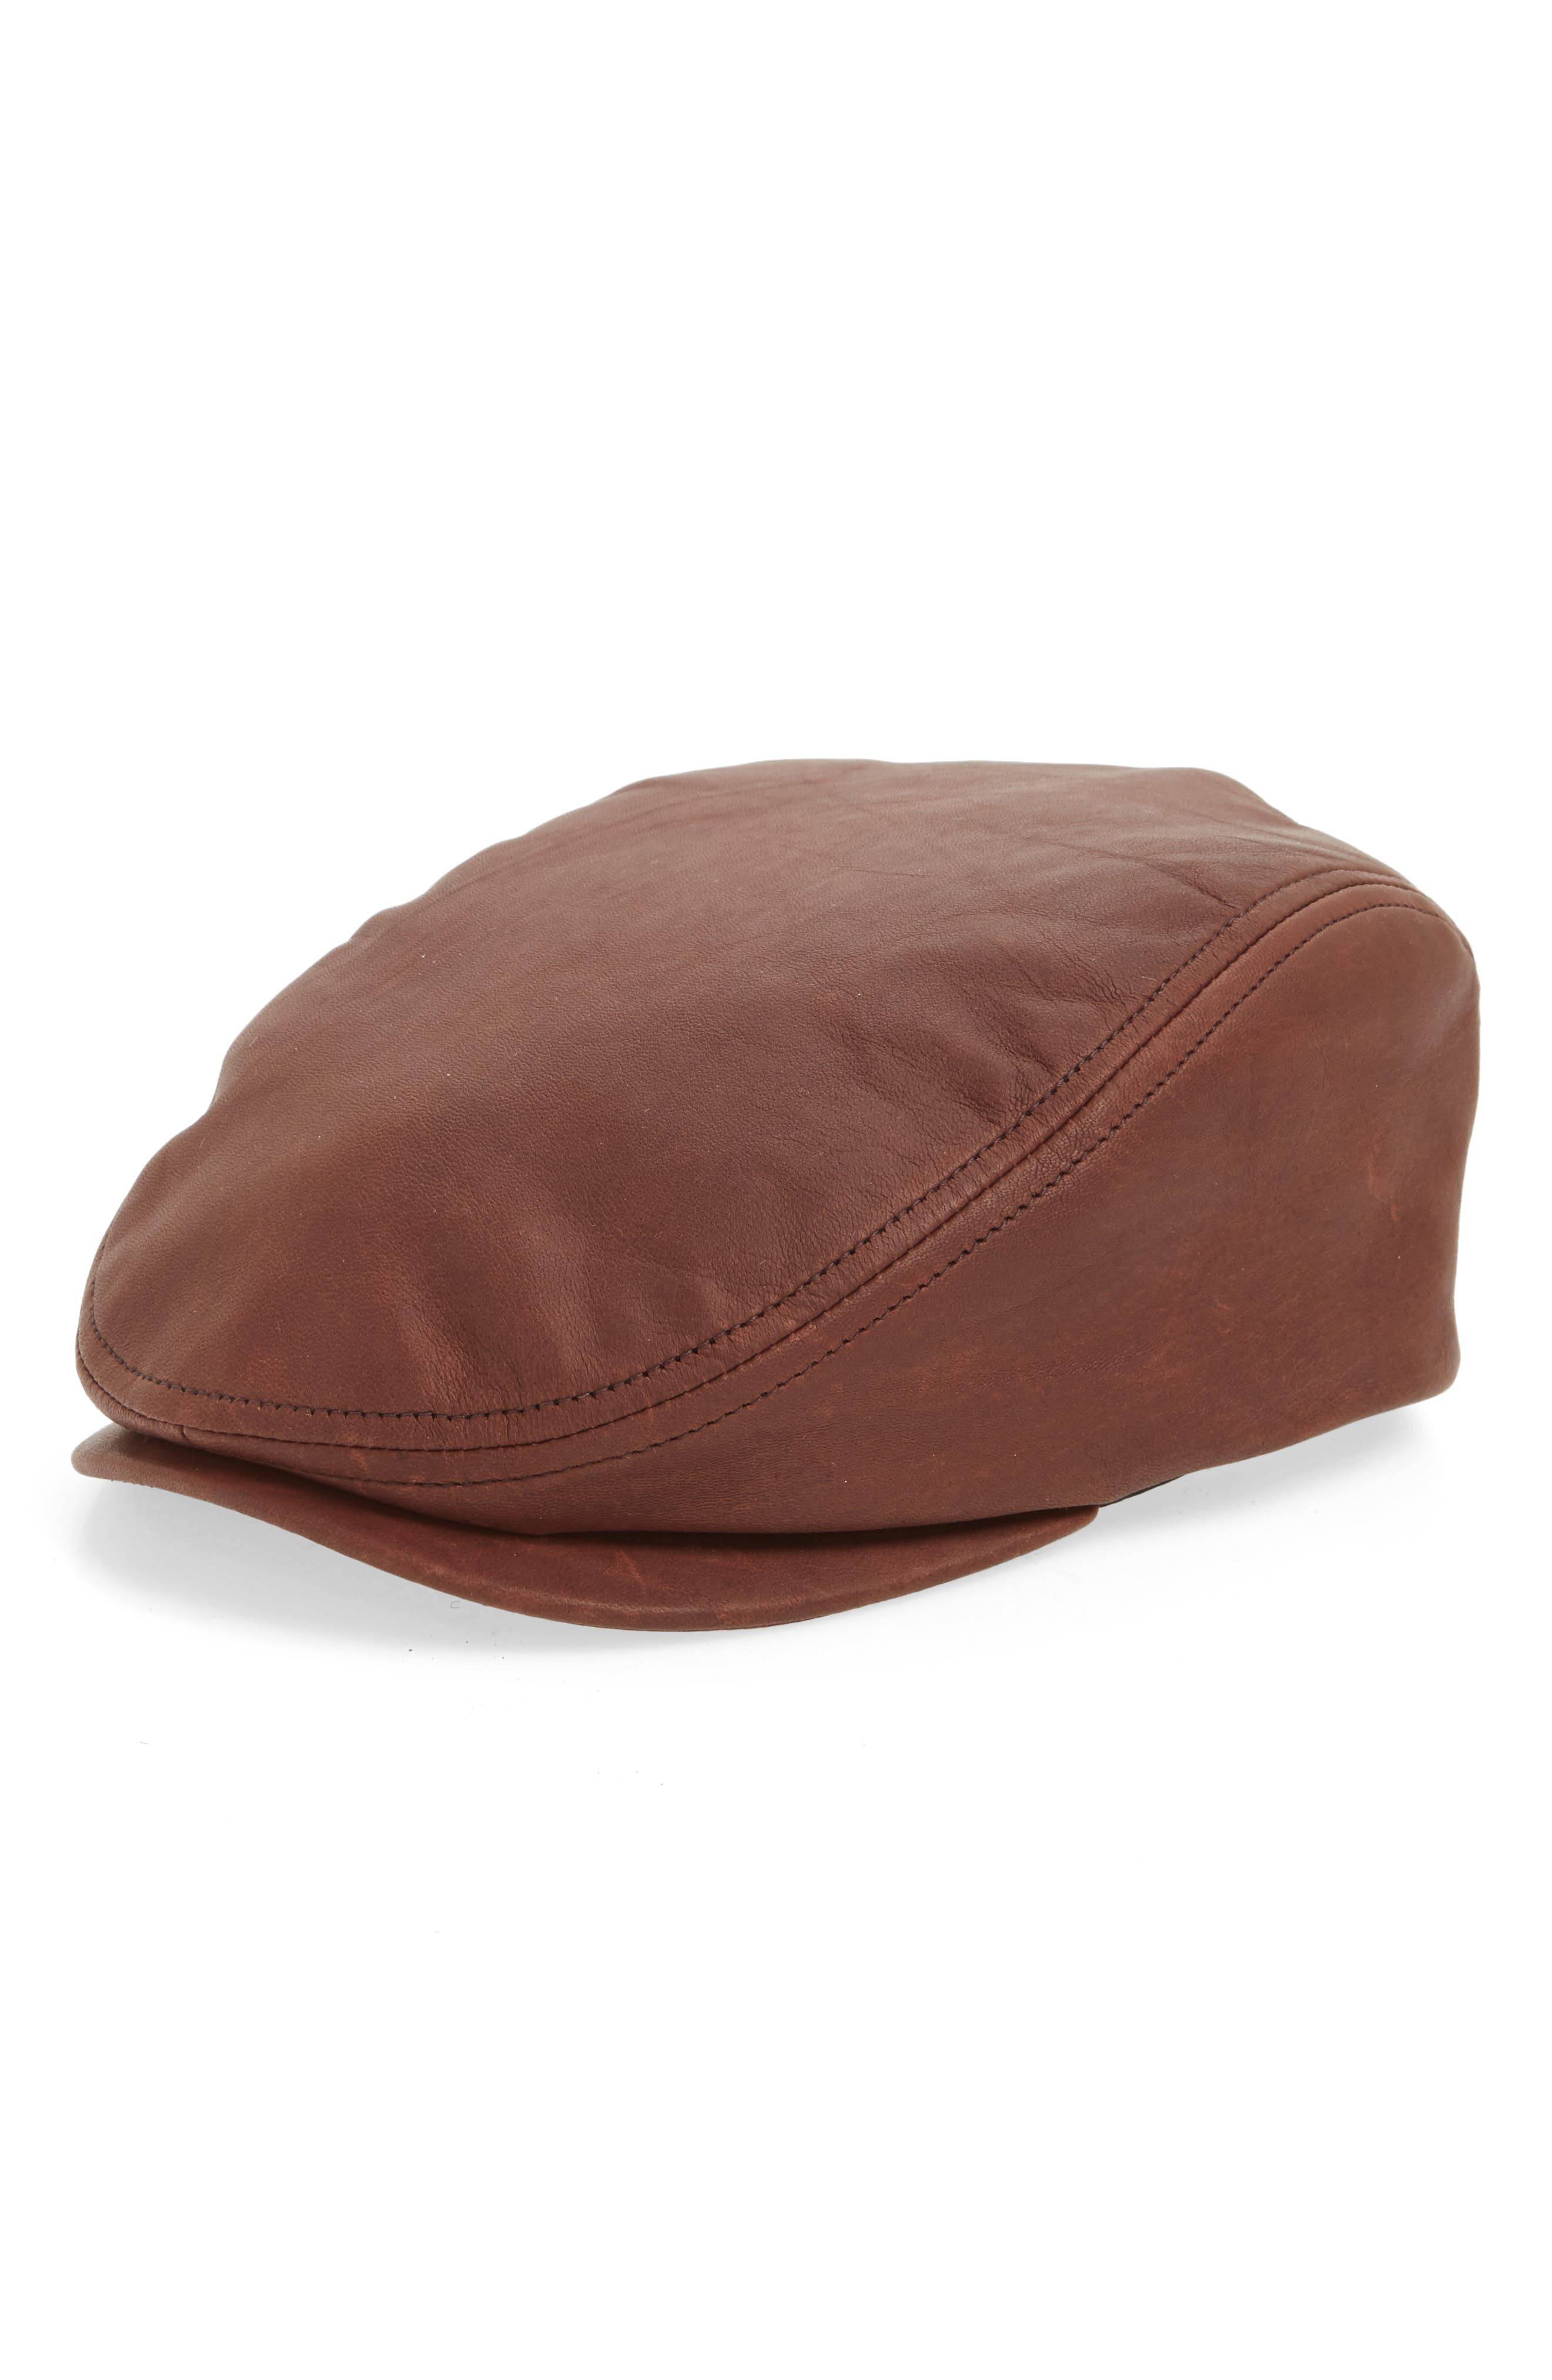 Main Image - Crown Cap Leather Driving Cap